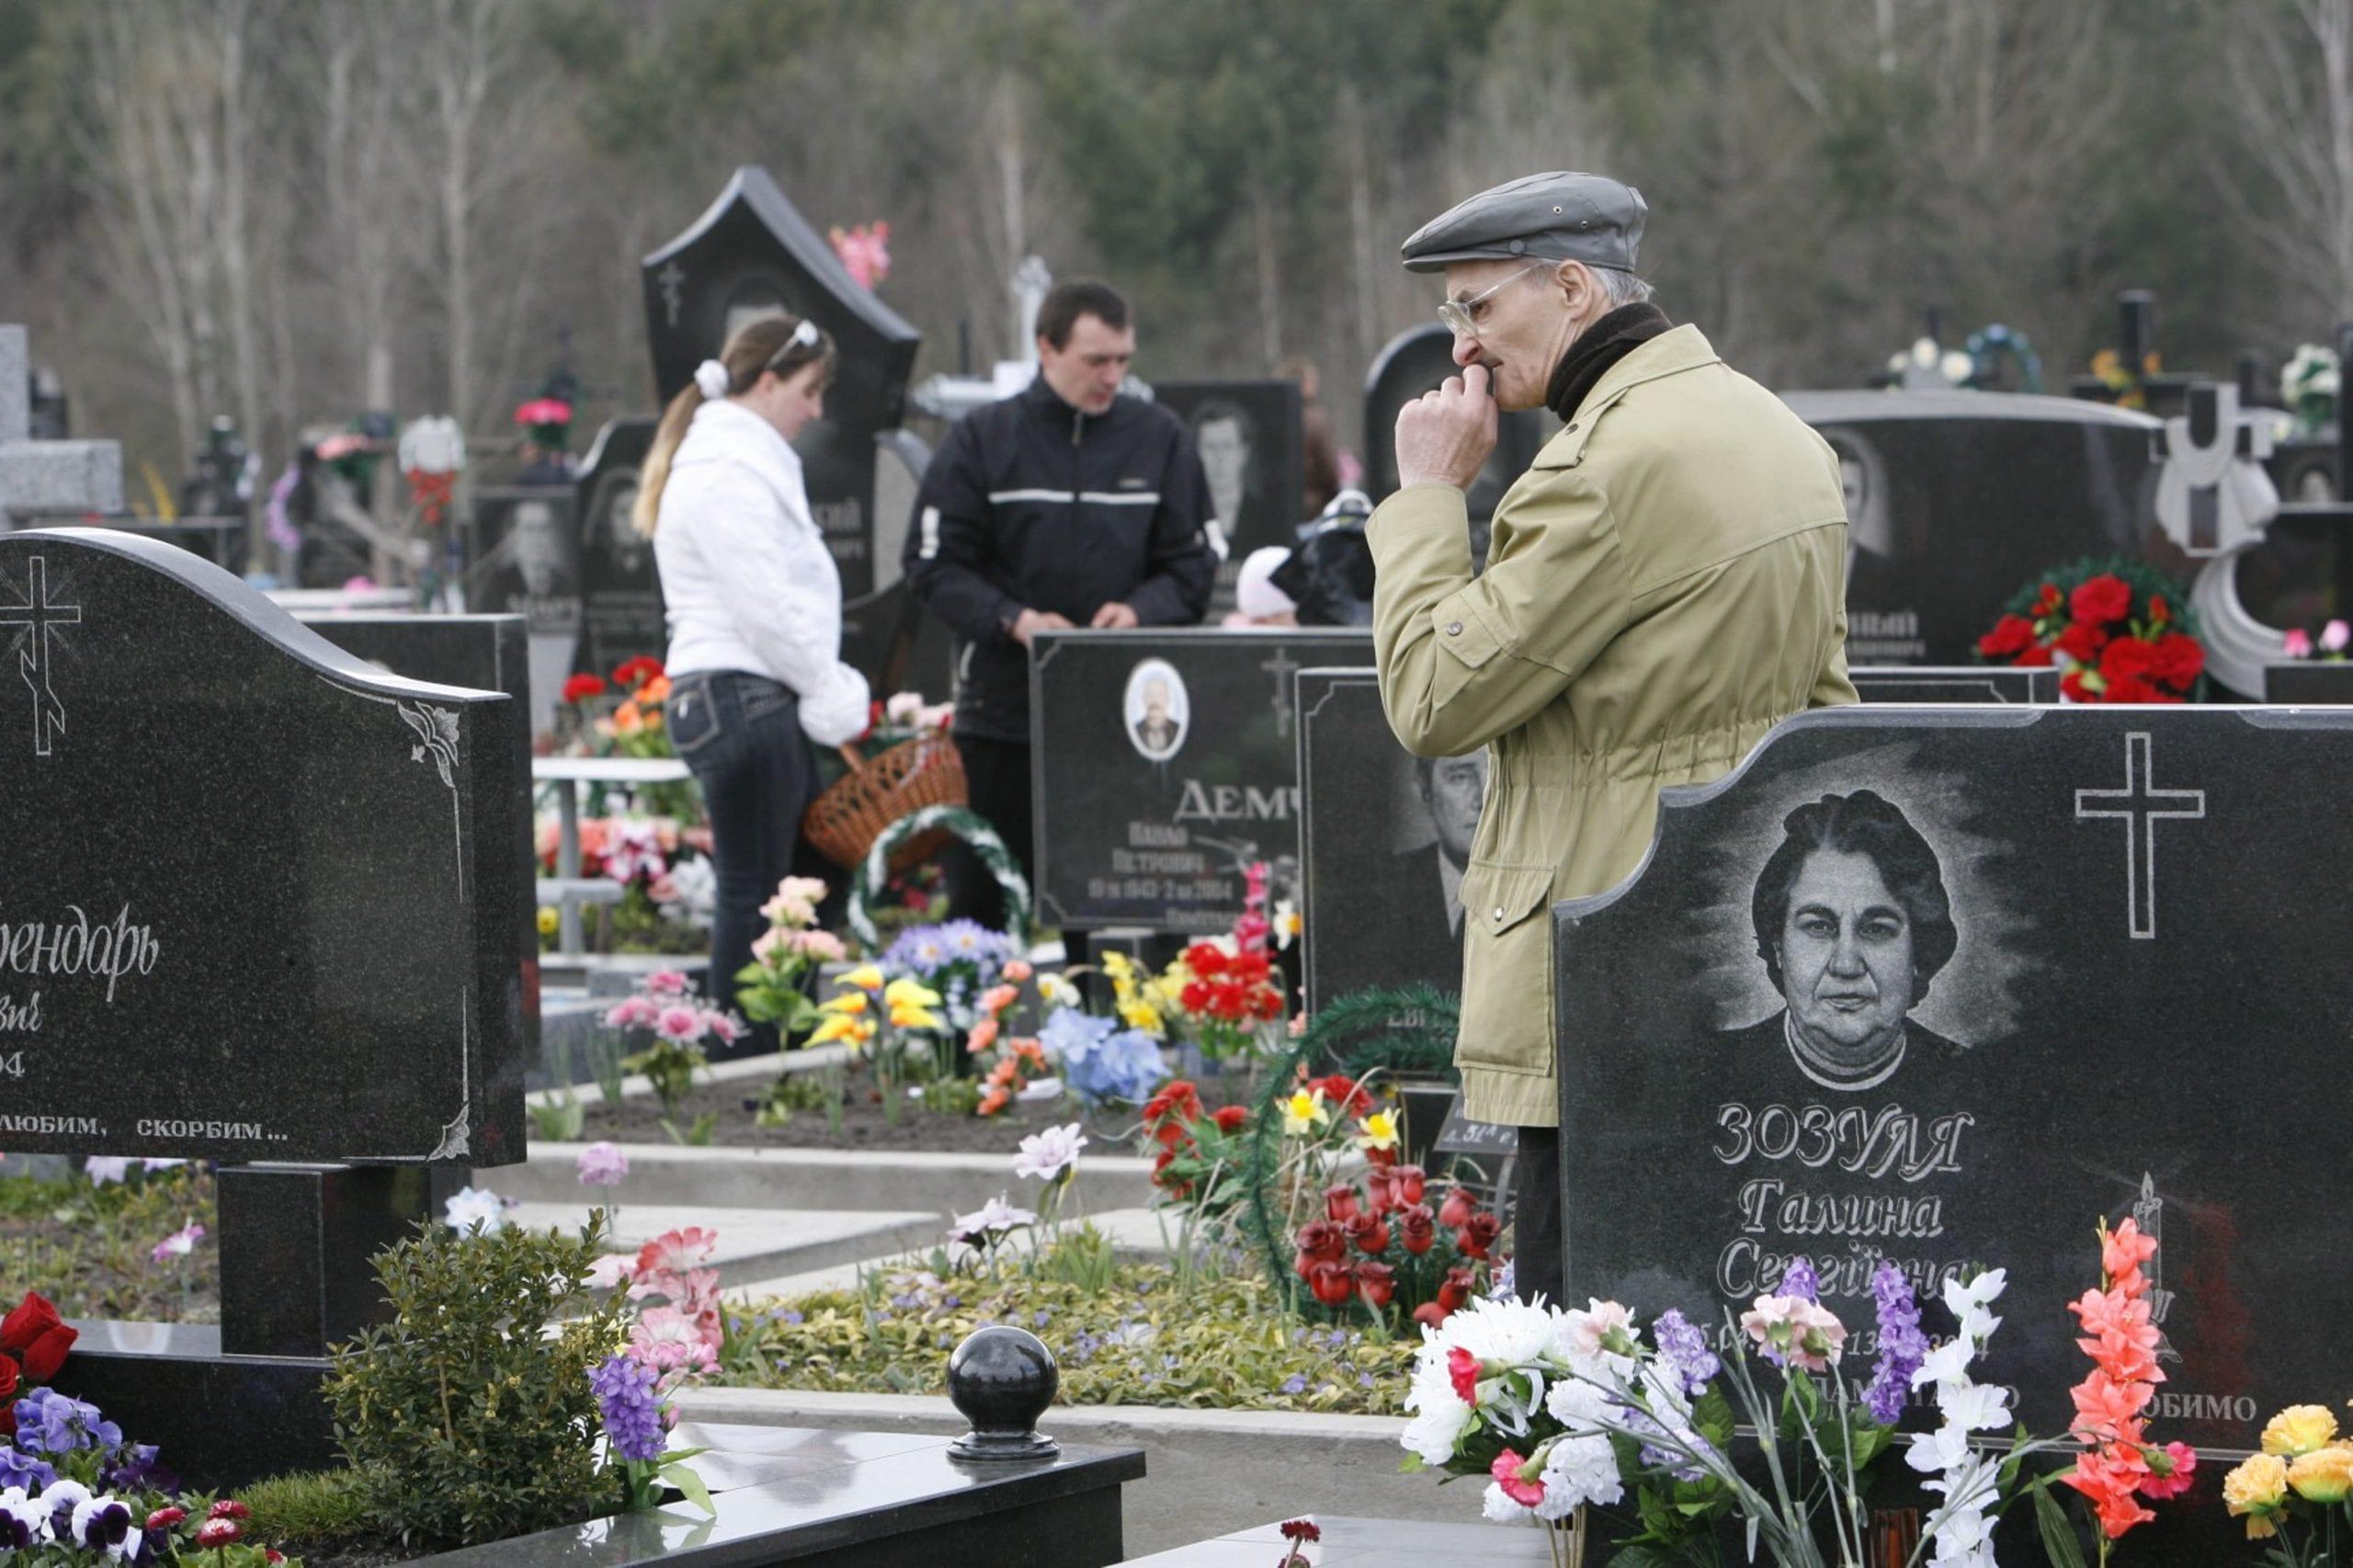 kostyantin chernichkin 02 scaled - <b>В Украине проходят Гробки, когда люди устраивают трапезы на кладбищах.</b> Объясняем, что это за традиция - Заборона